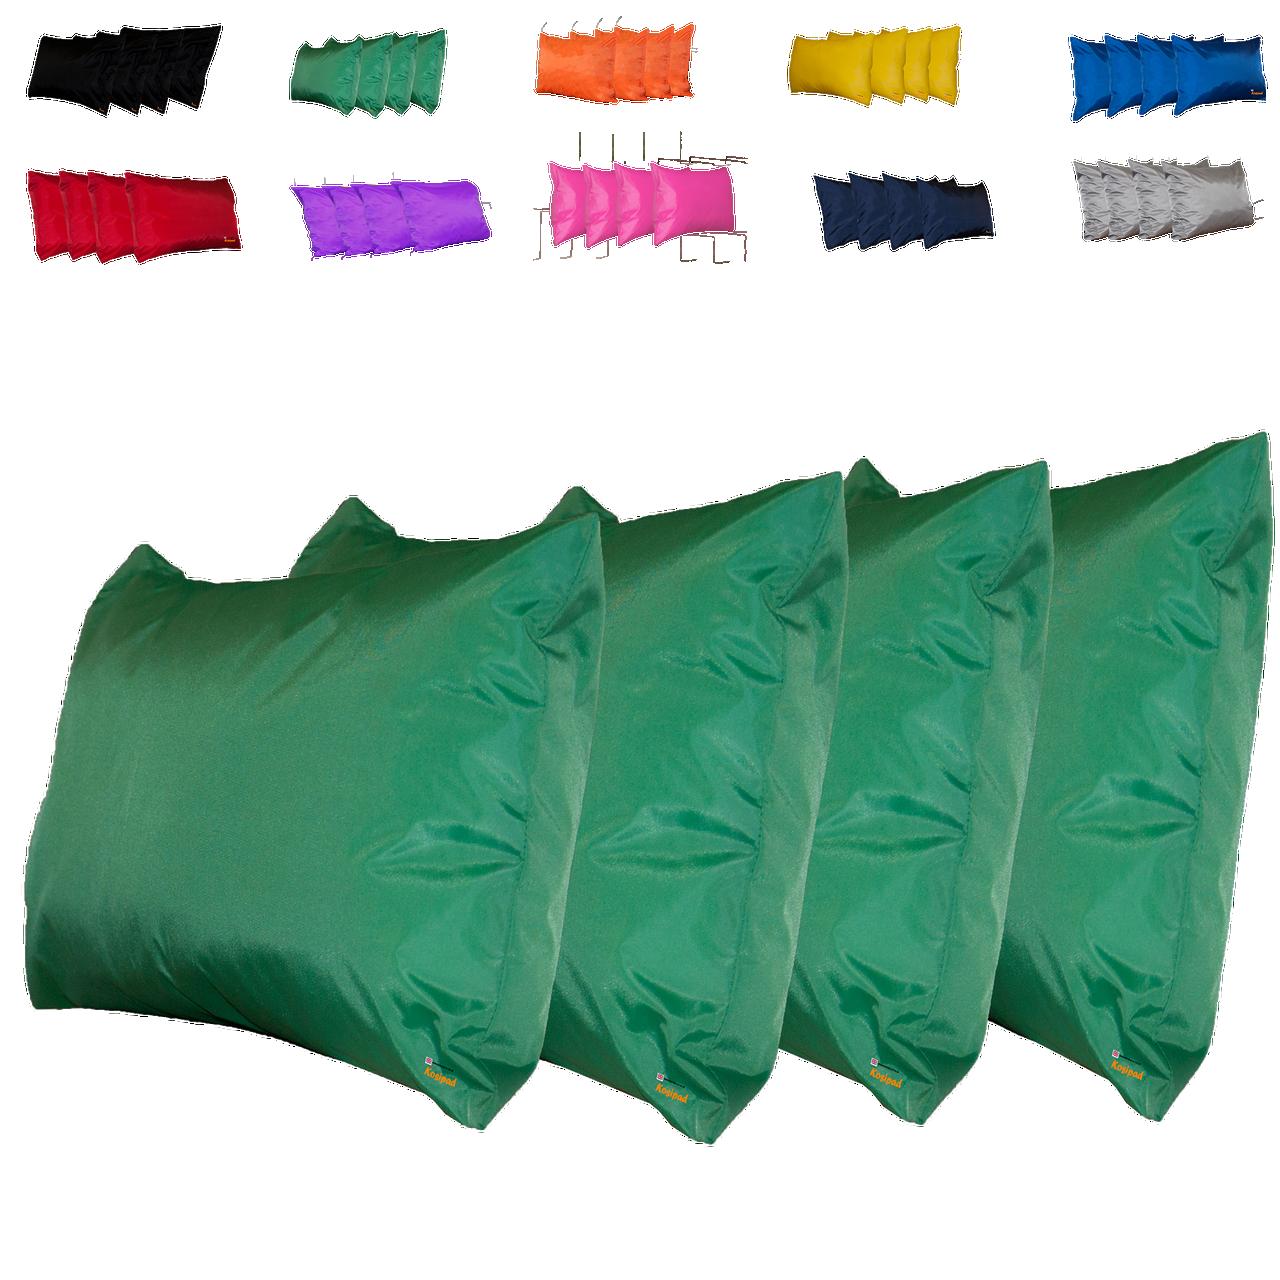 Kosipad Green Square outdoor cushions waterproof